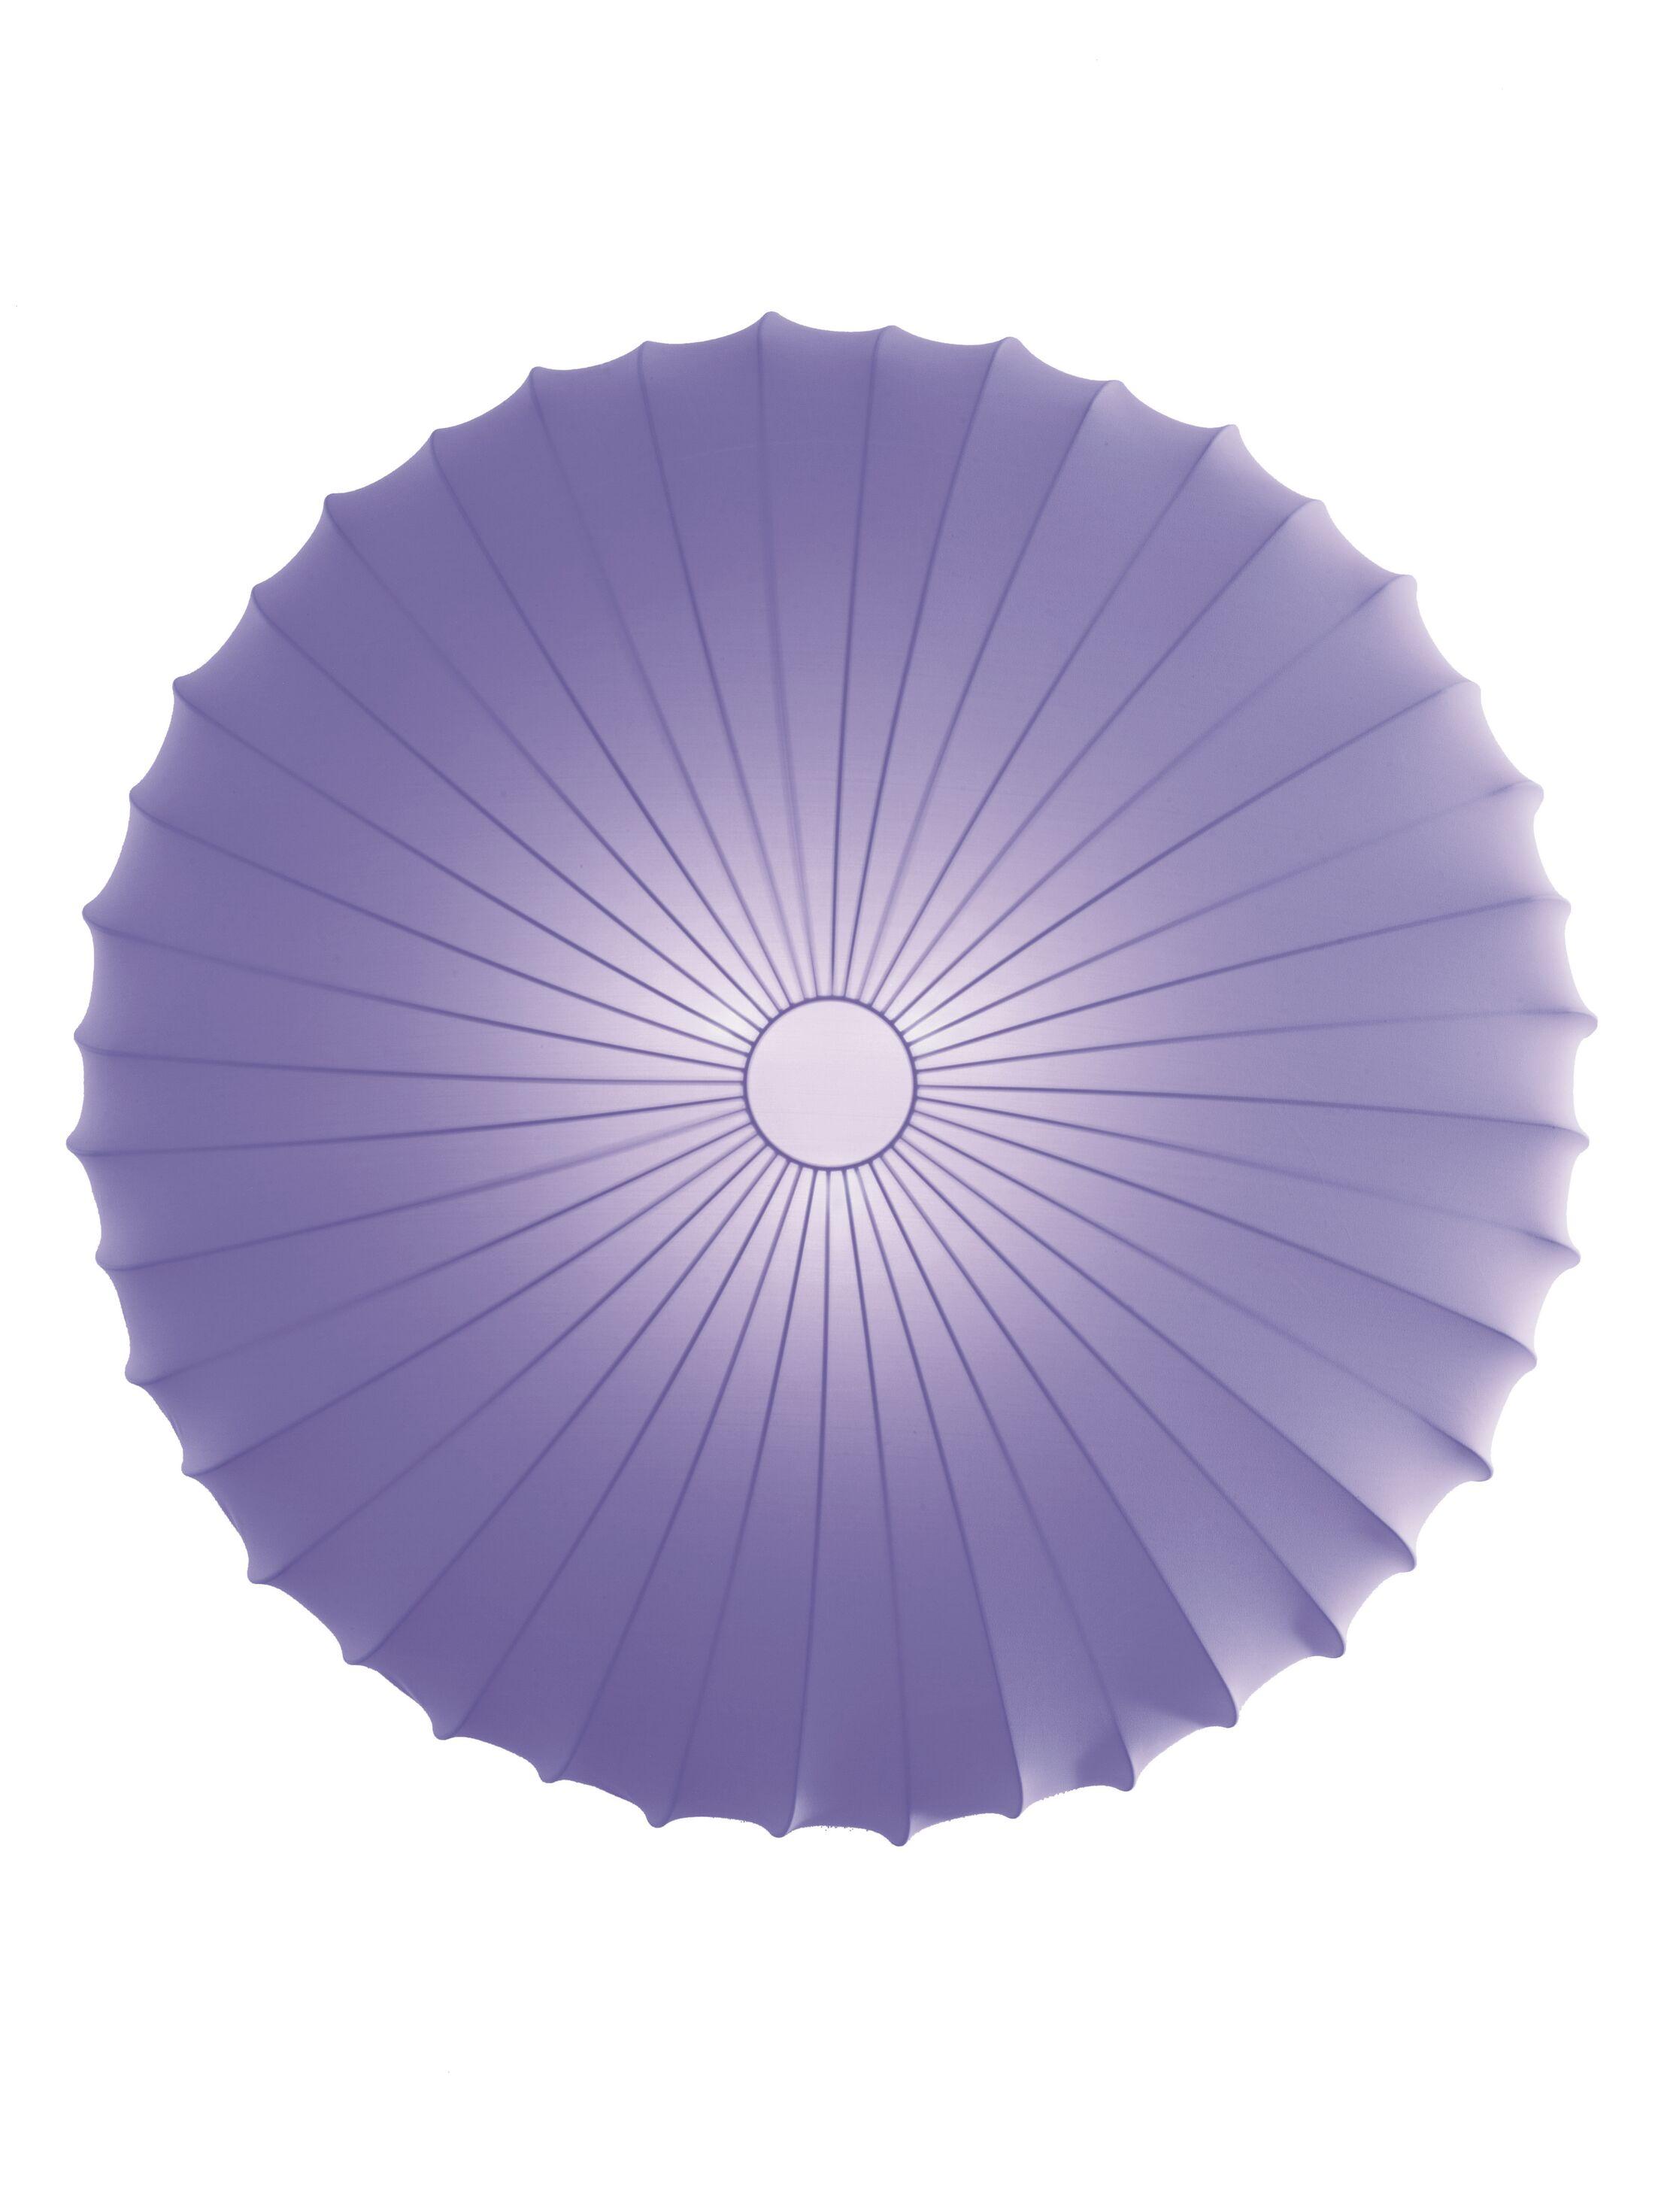 Muse 3-Light Flush Mount Size: Extra Large, Color: Violet, Bulb Type: Fluorescent/Incandescent